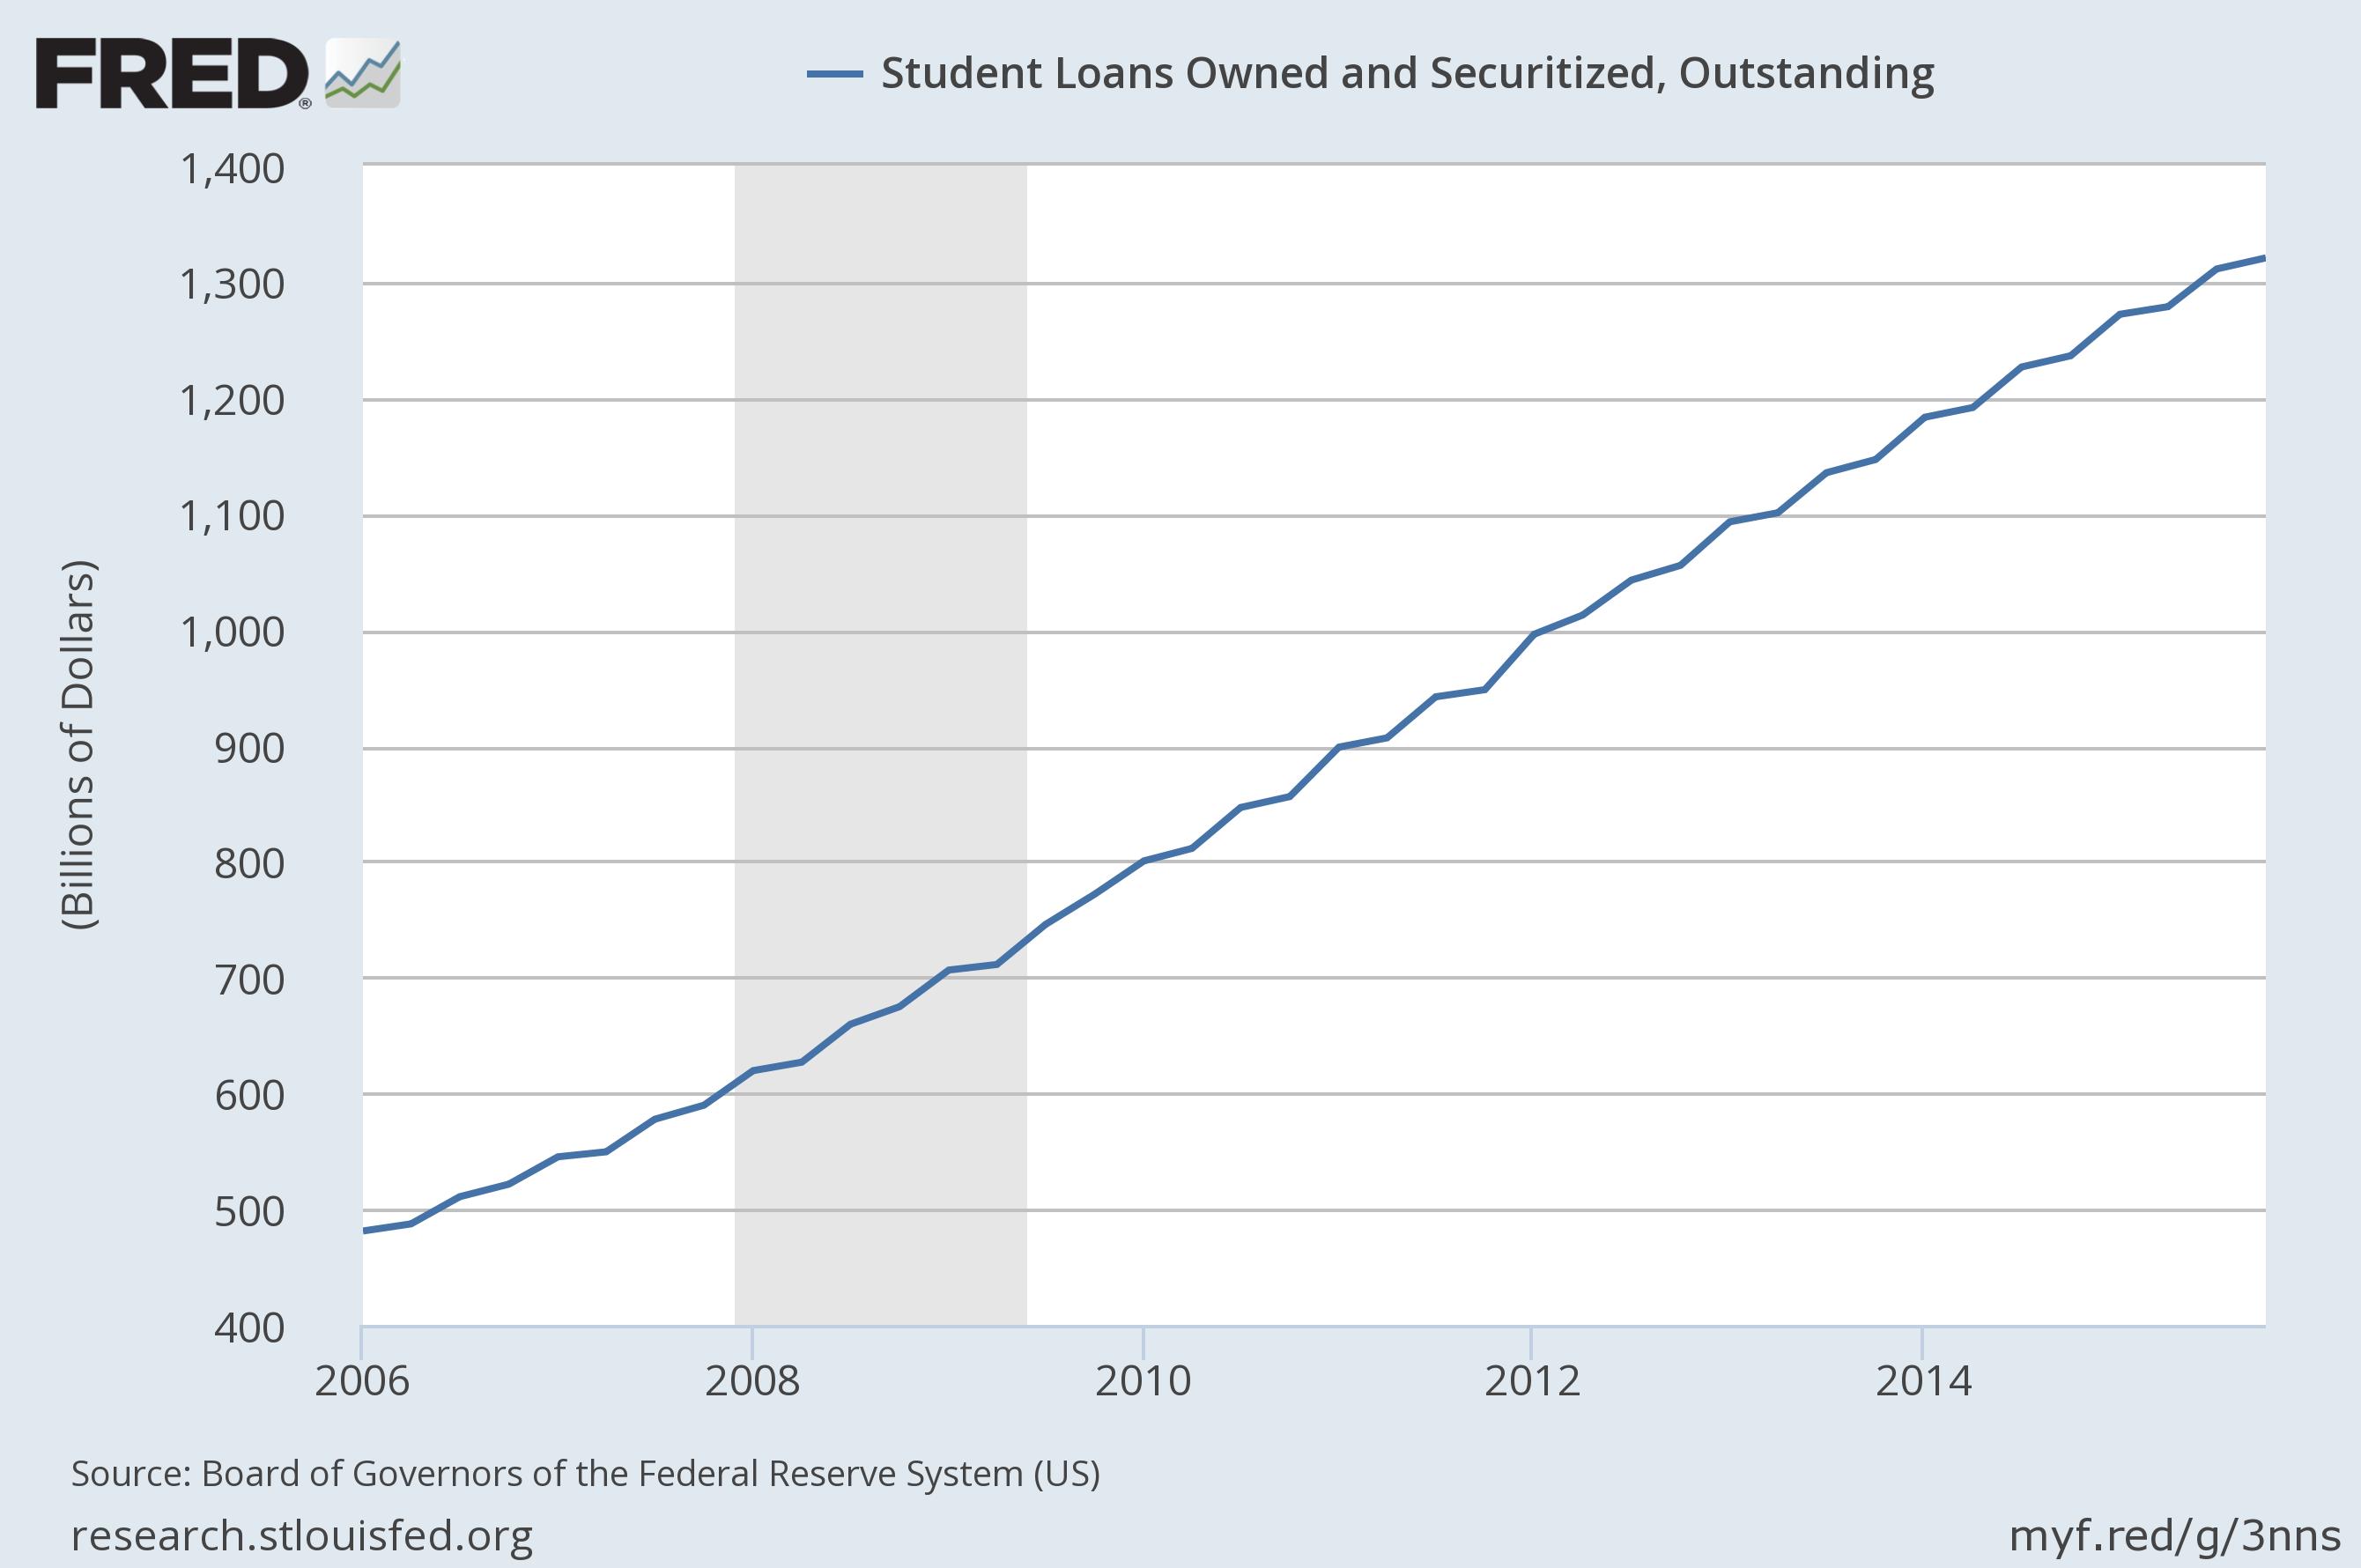 fredgraph-student-debt